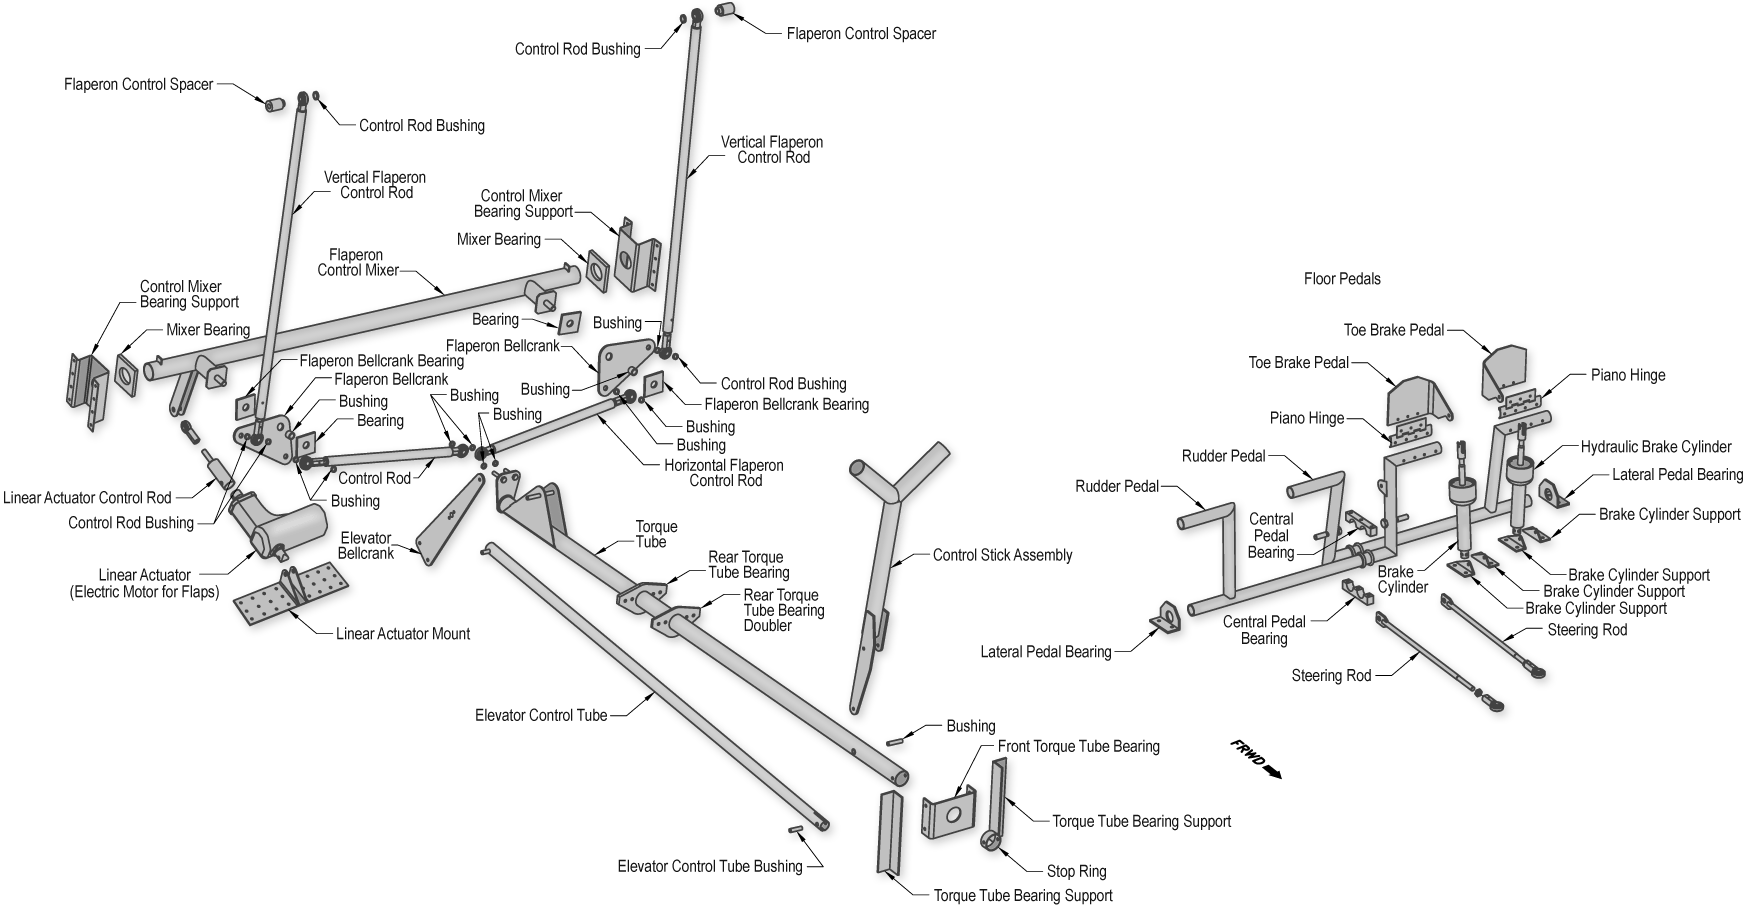 Elevator Wiring Diagram